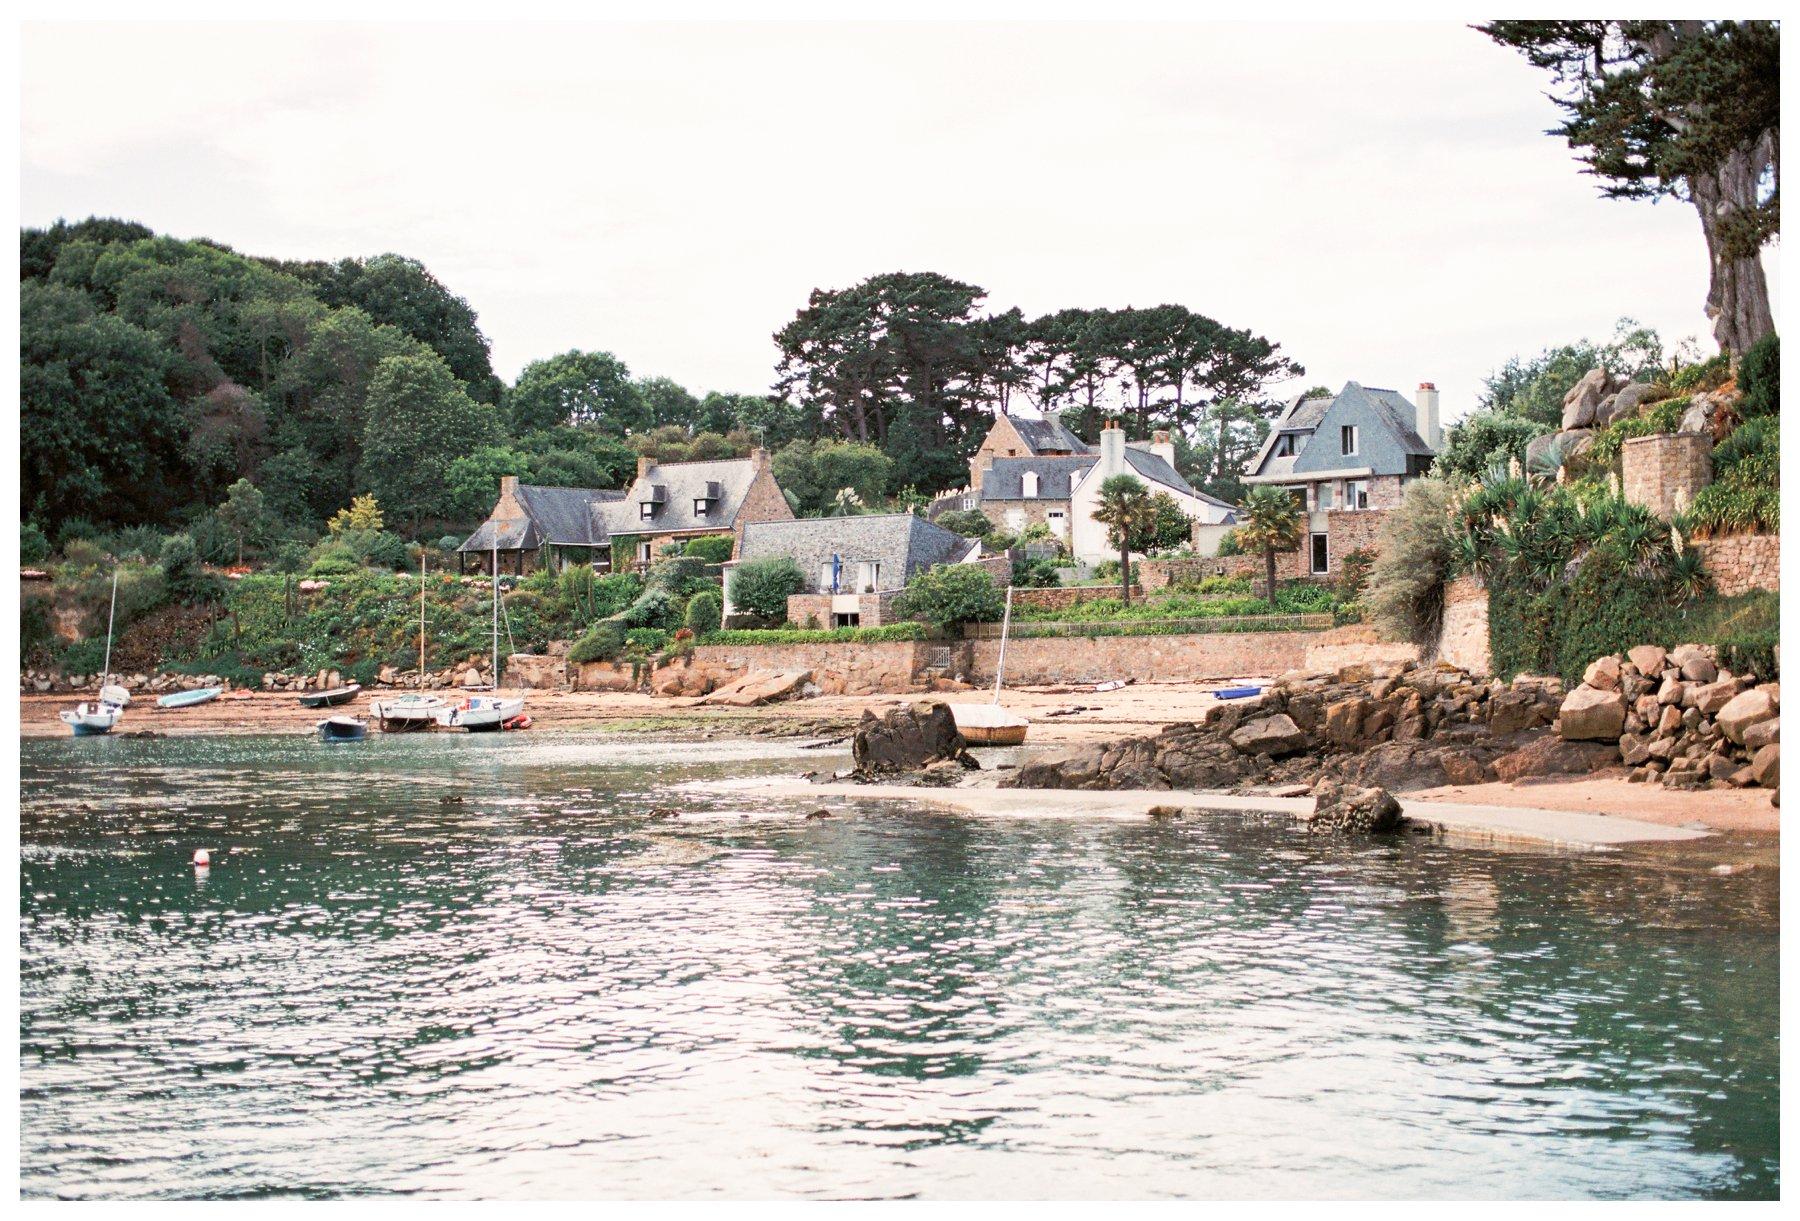 film photography of Ile de Brehat, France